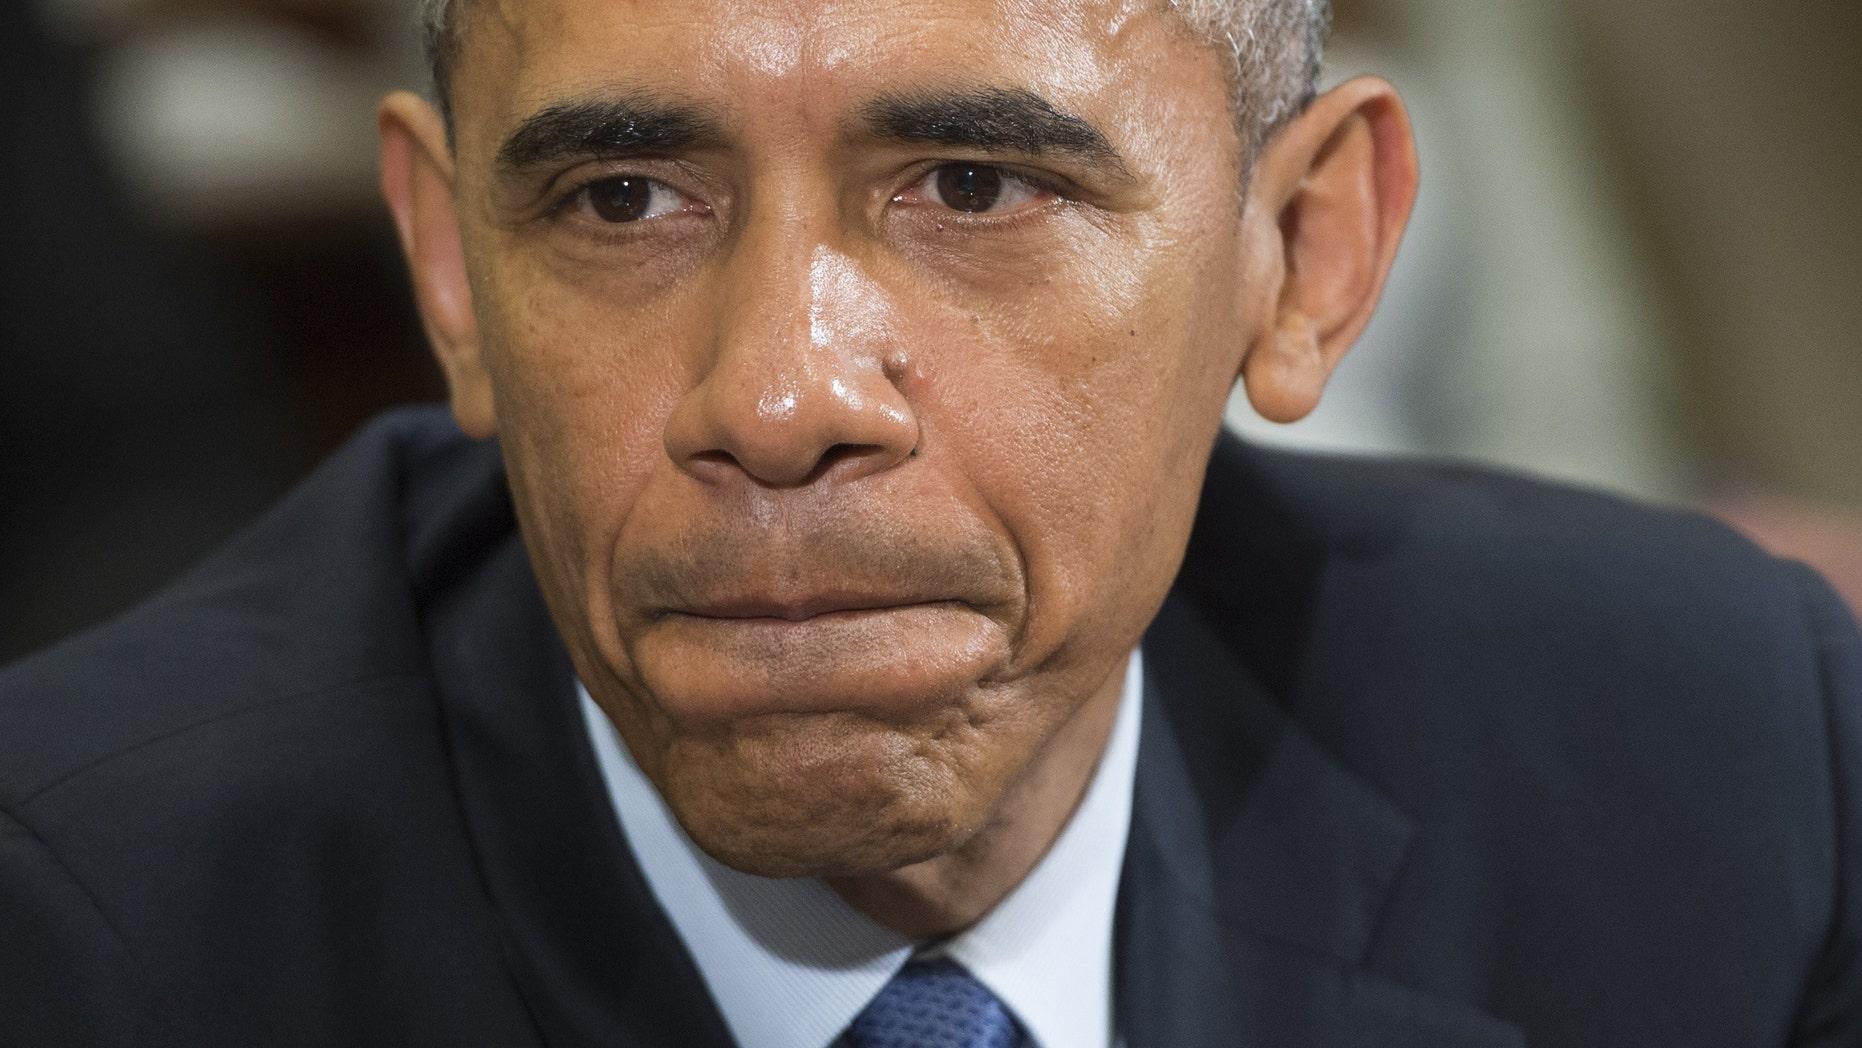 US President Barack Obama. (Photo: SAUL LOEB/AFP/Getty Images)